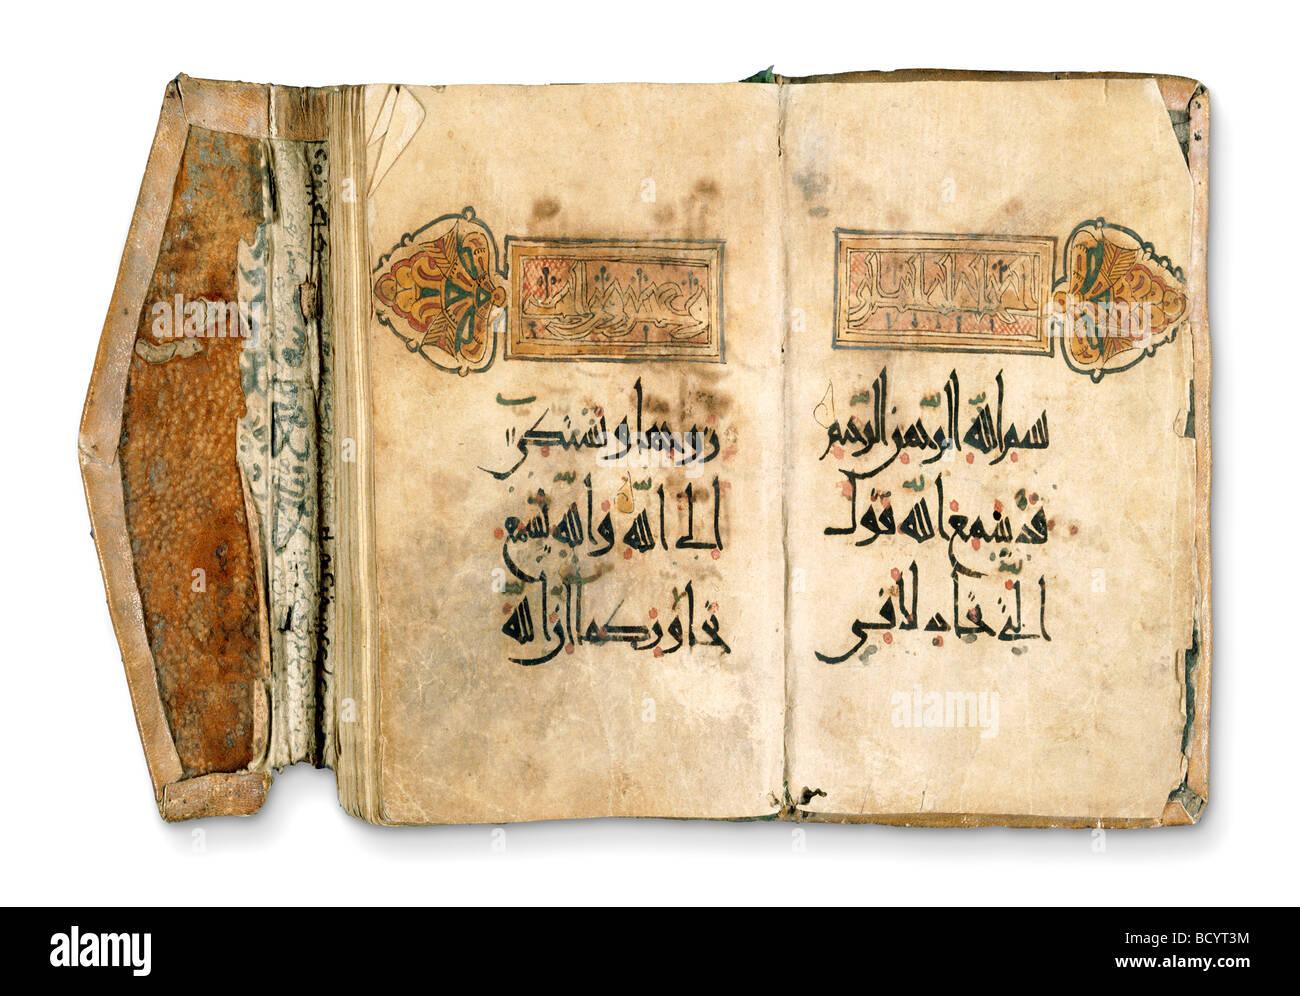 The Koran. Iraq, 17th century - Stock Image